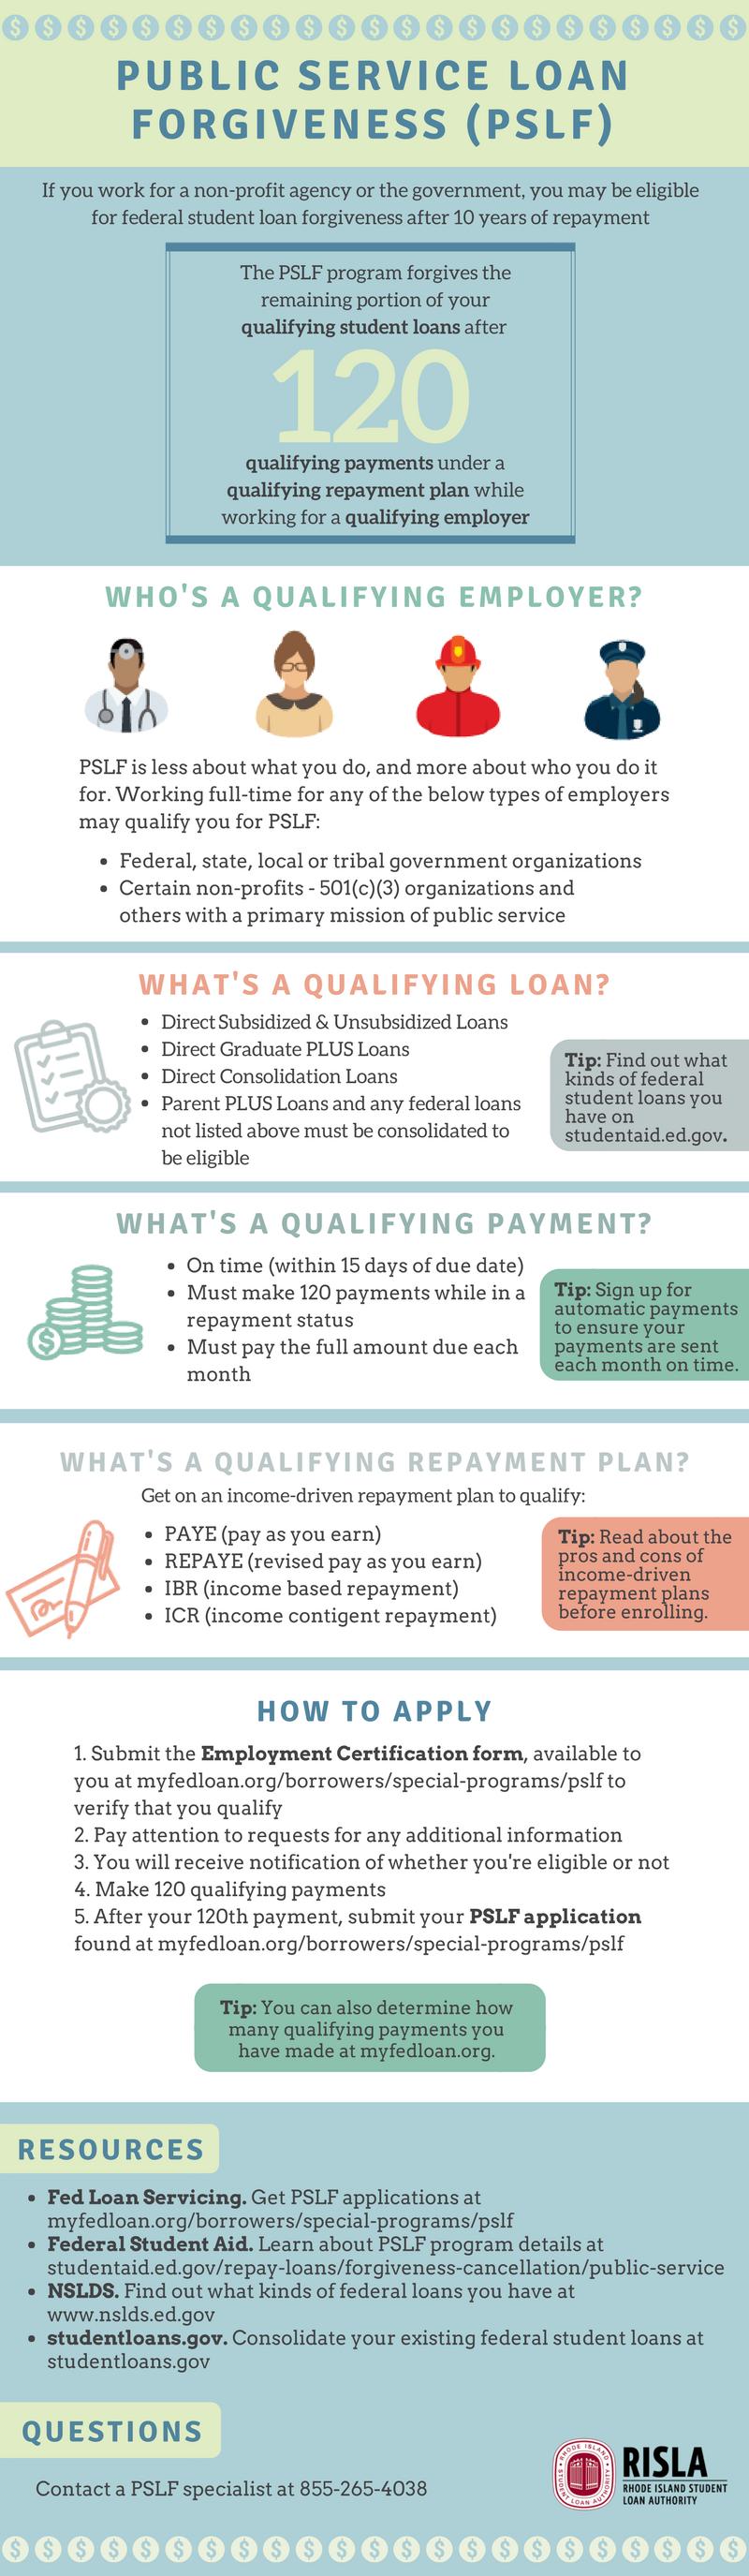 Public Service Loan Forgiveness Pslf Employment Certification Form